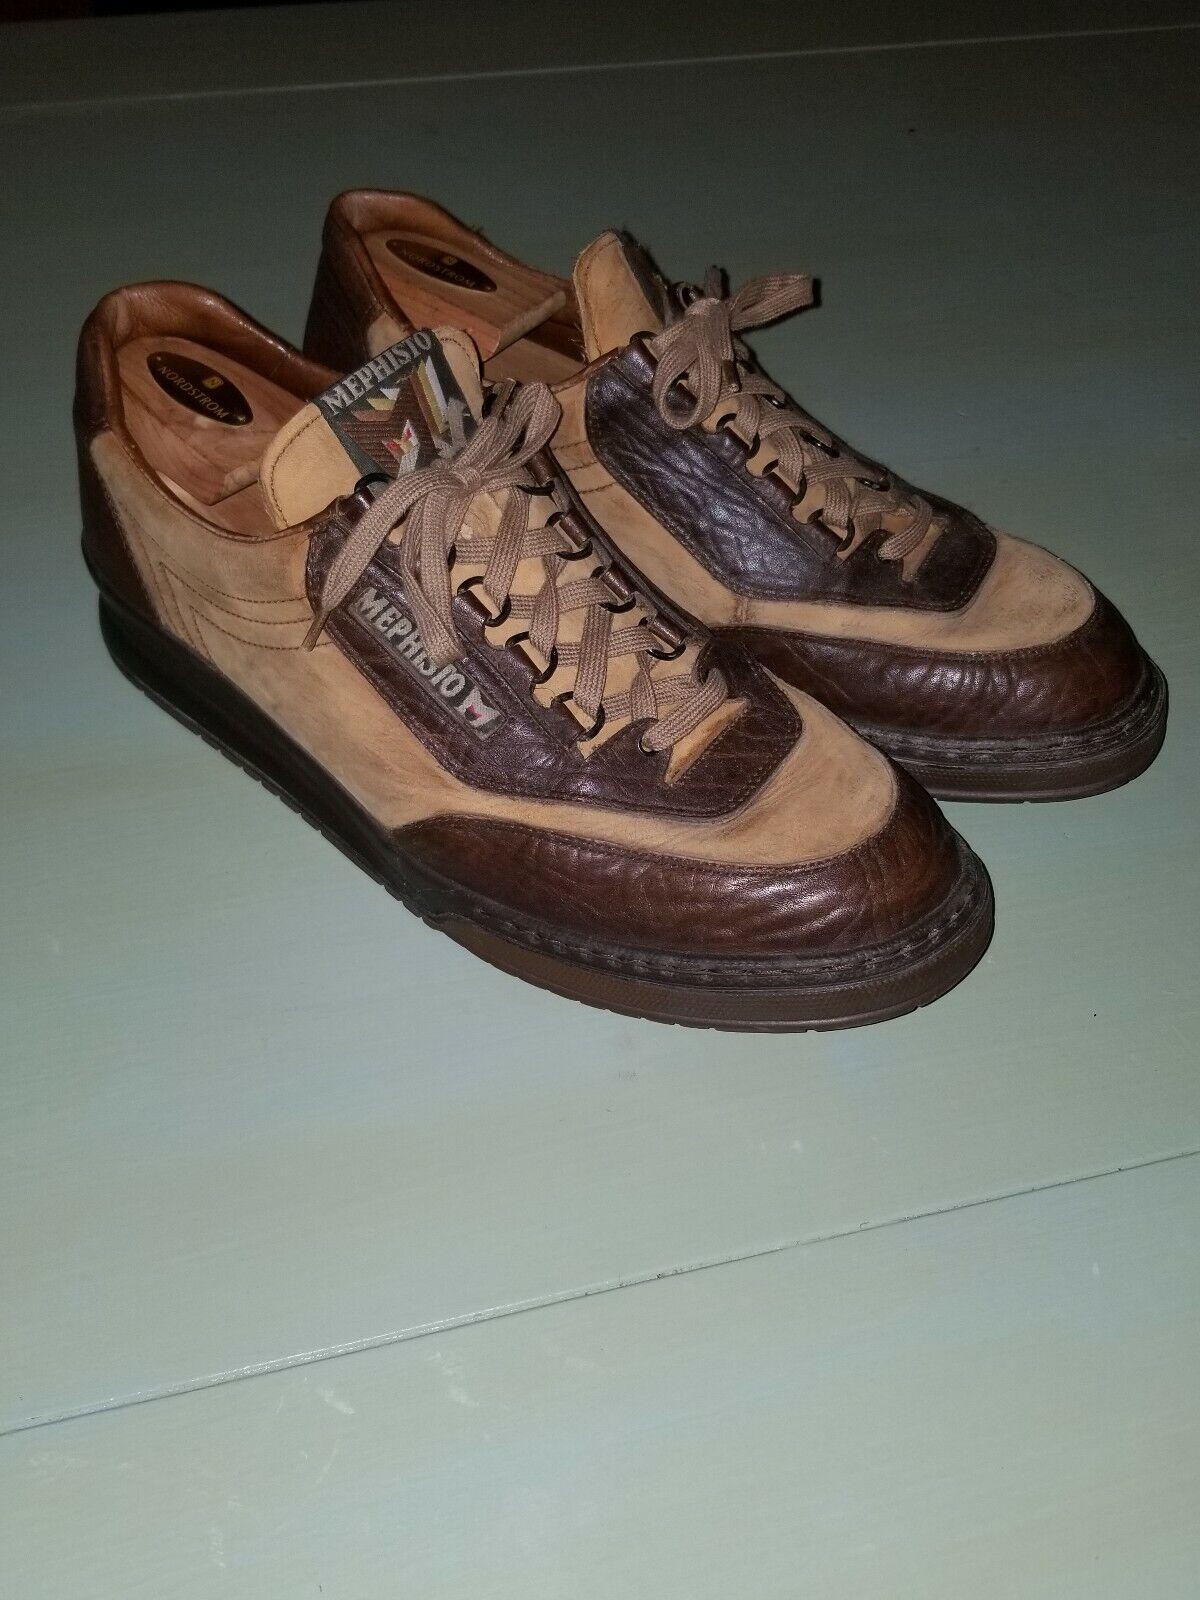 Mephisto Men's Suede scarpe Dimensione US 12